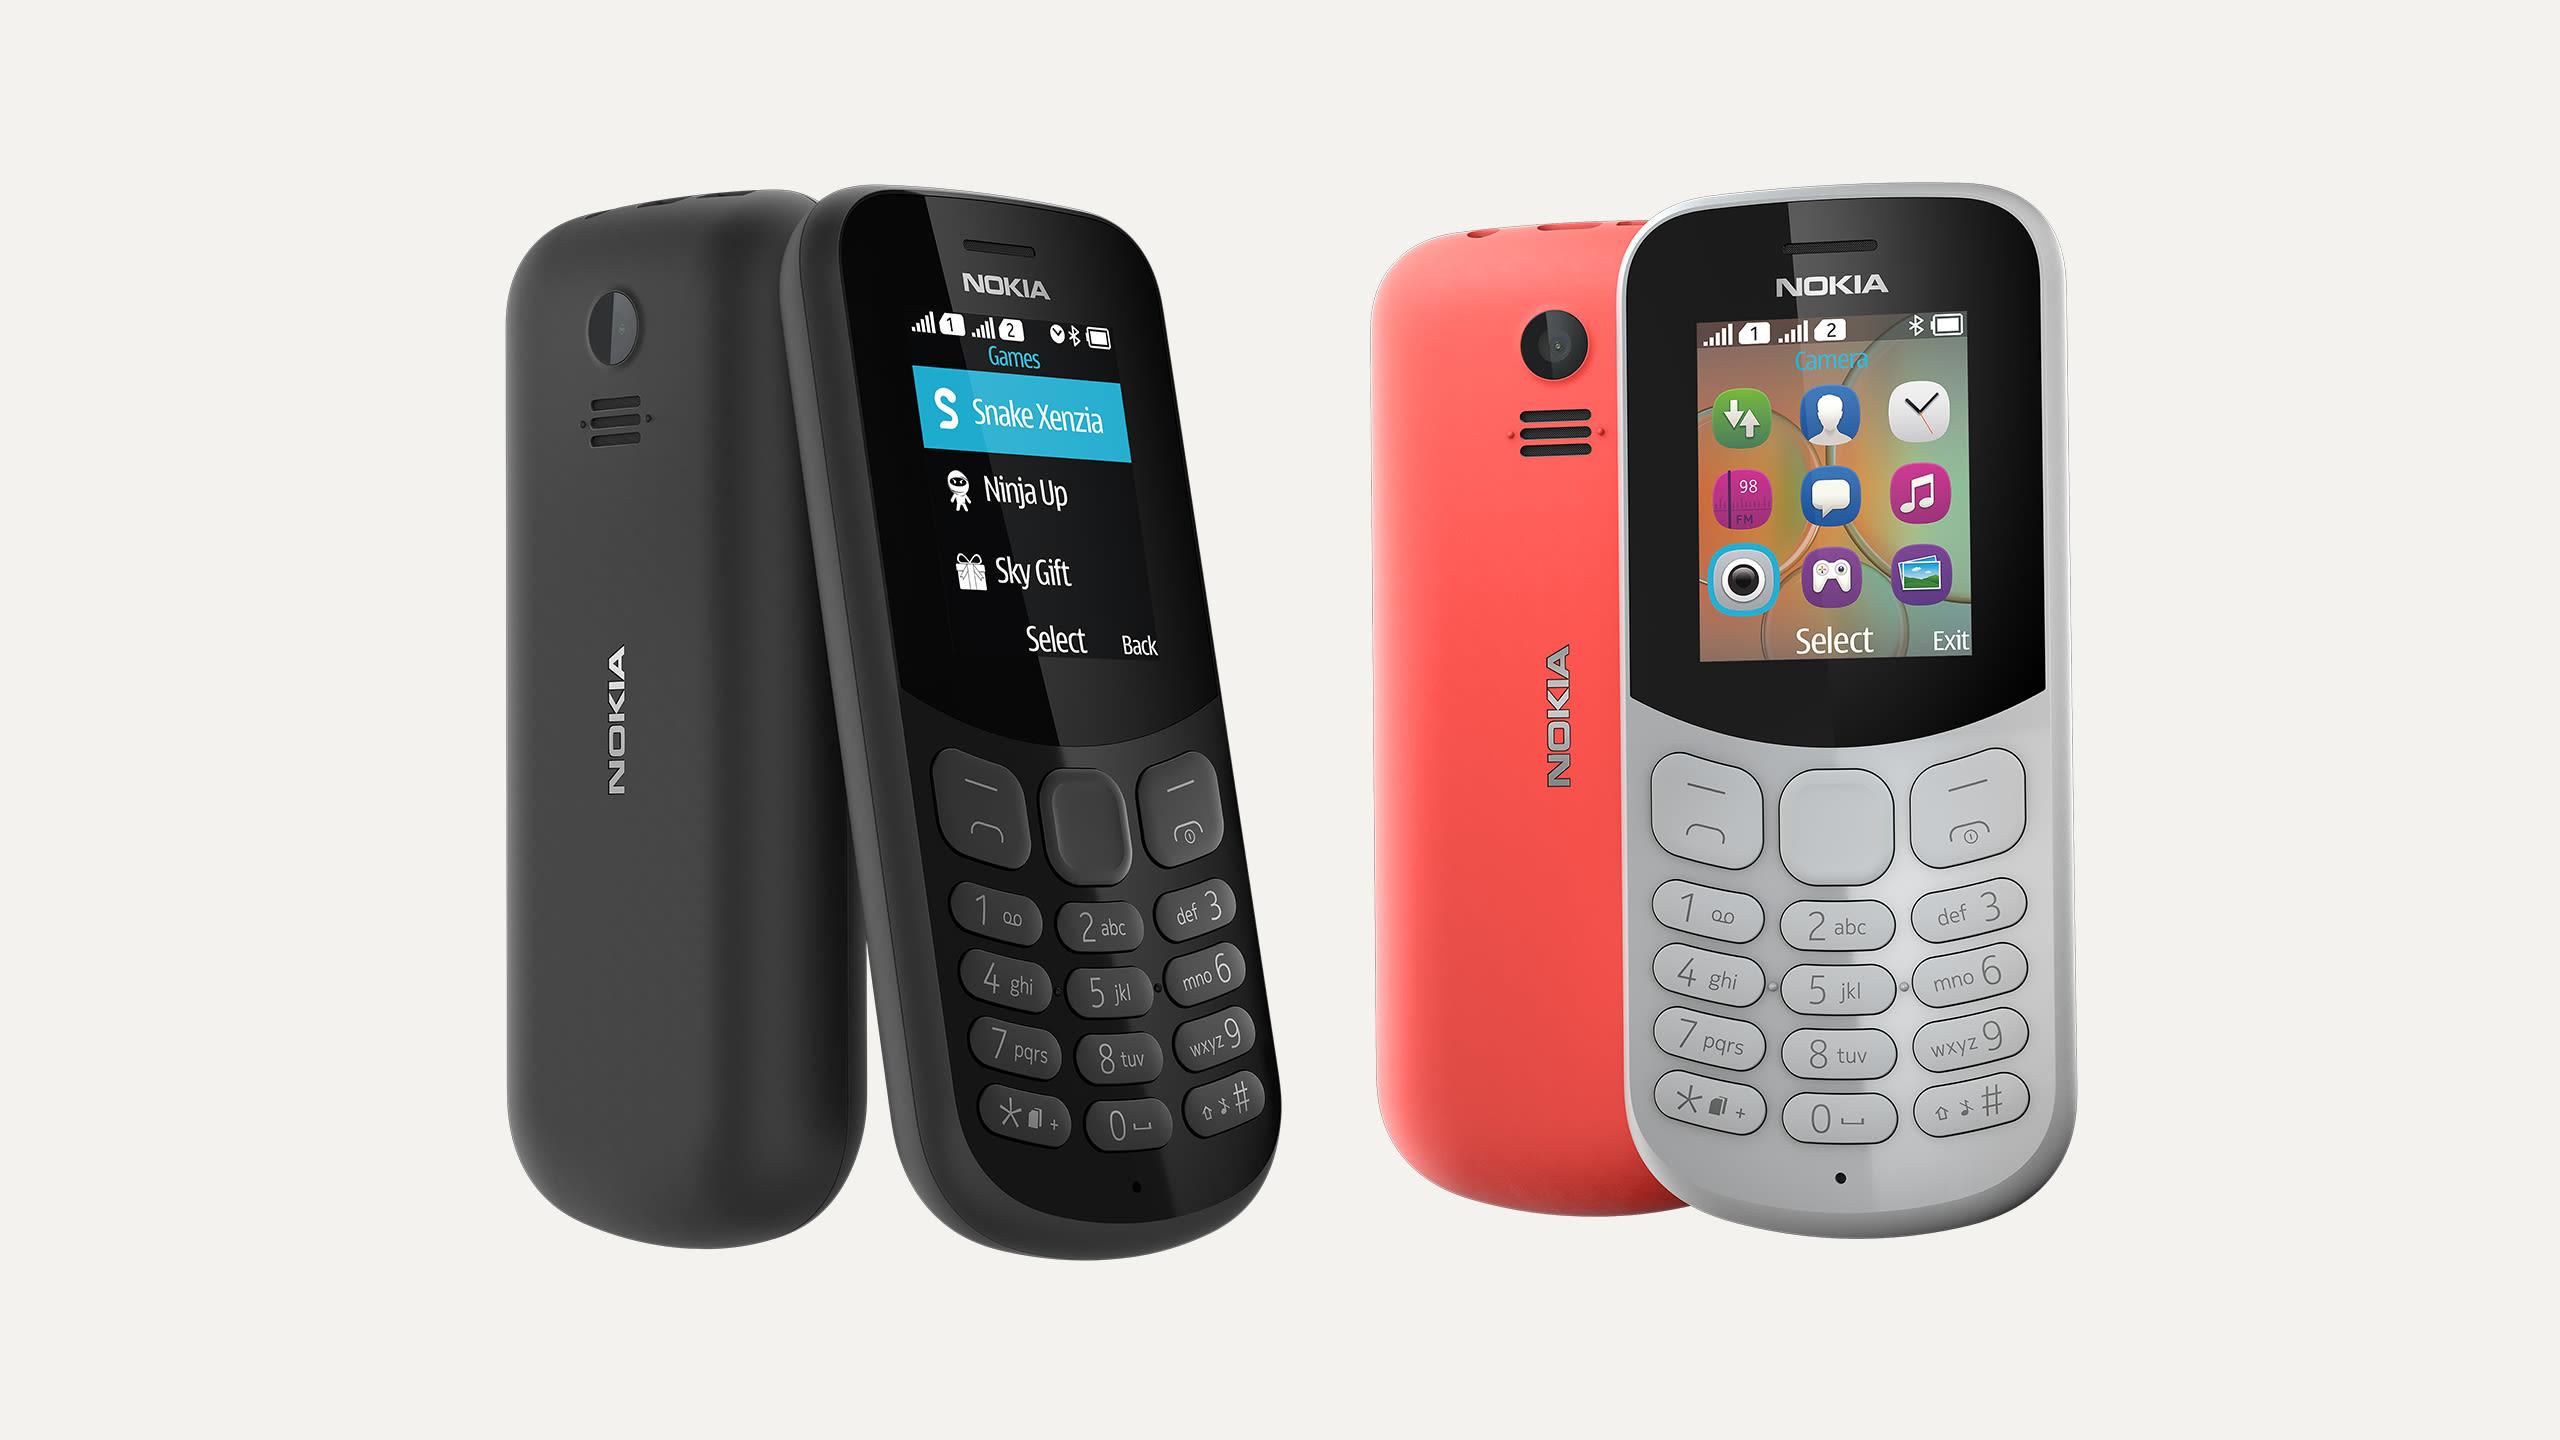 Nokia_130-beauty.jpg